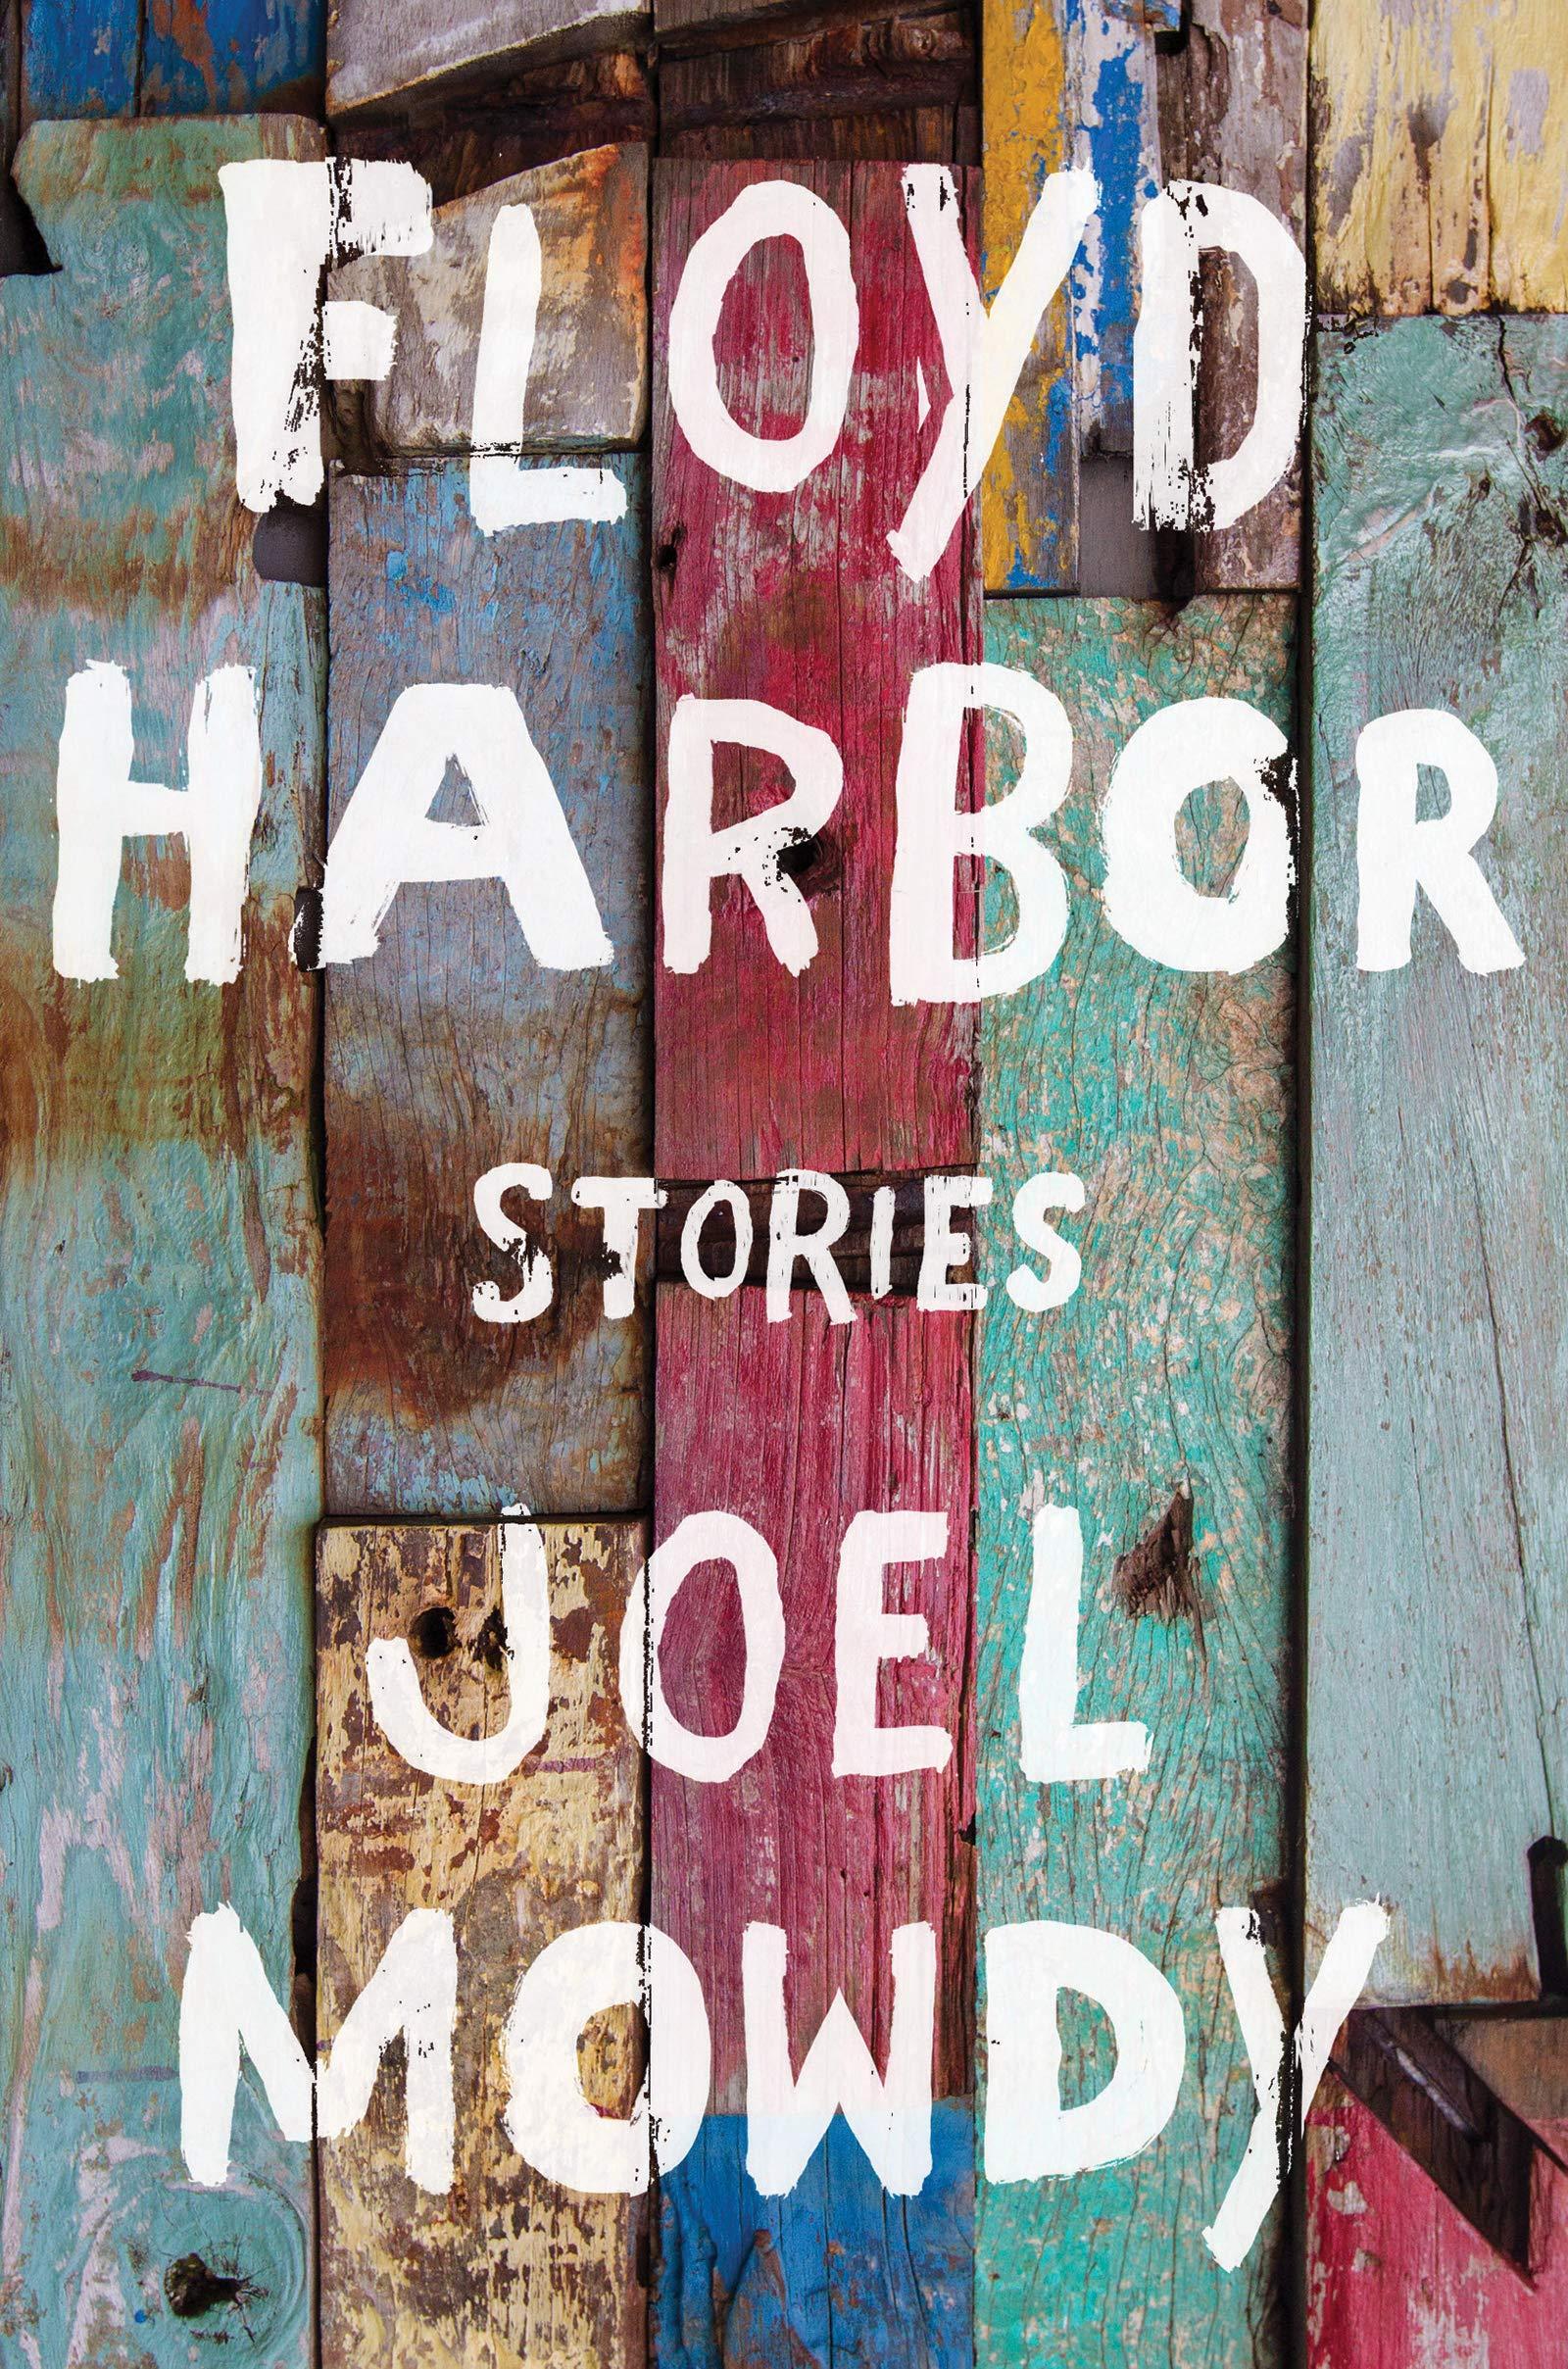 'Floyd Harbor' by Joel Mowdy: Harbor Lights, Suburban Sights, and Mean Streets - ZYZZYVA